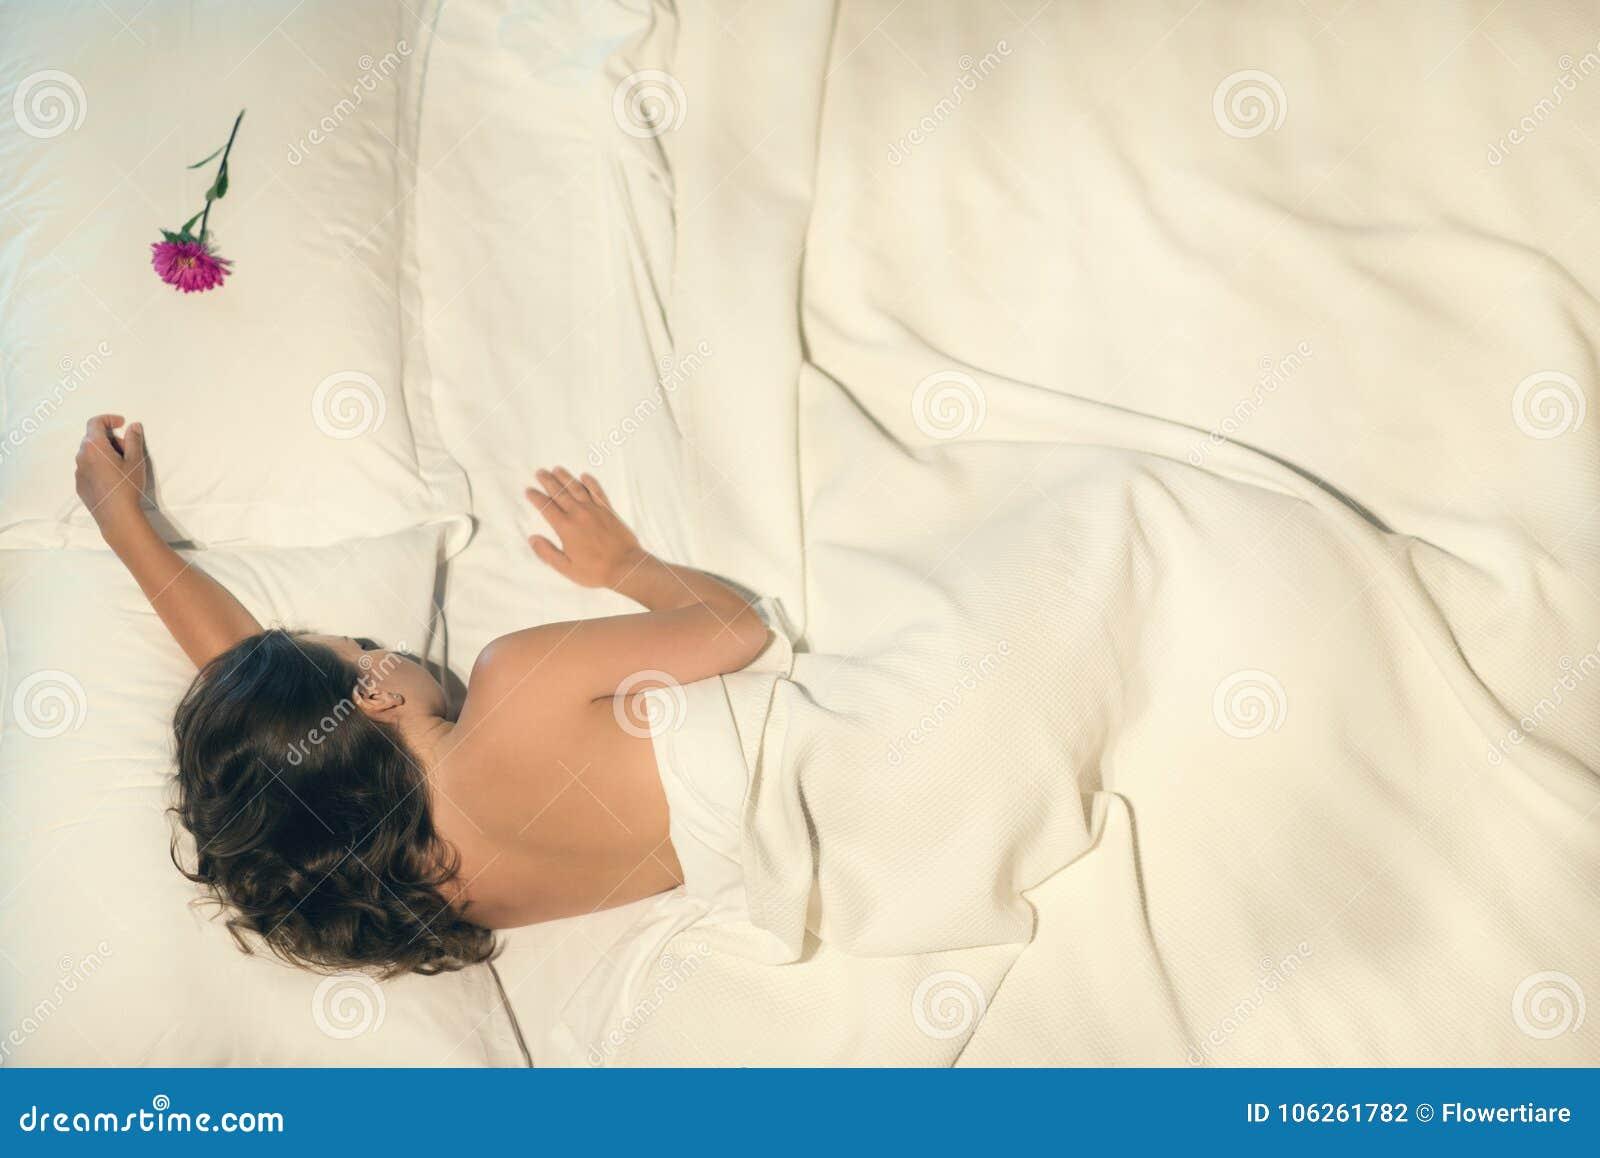 Join. camping sleeping naked girl idea